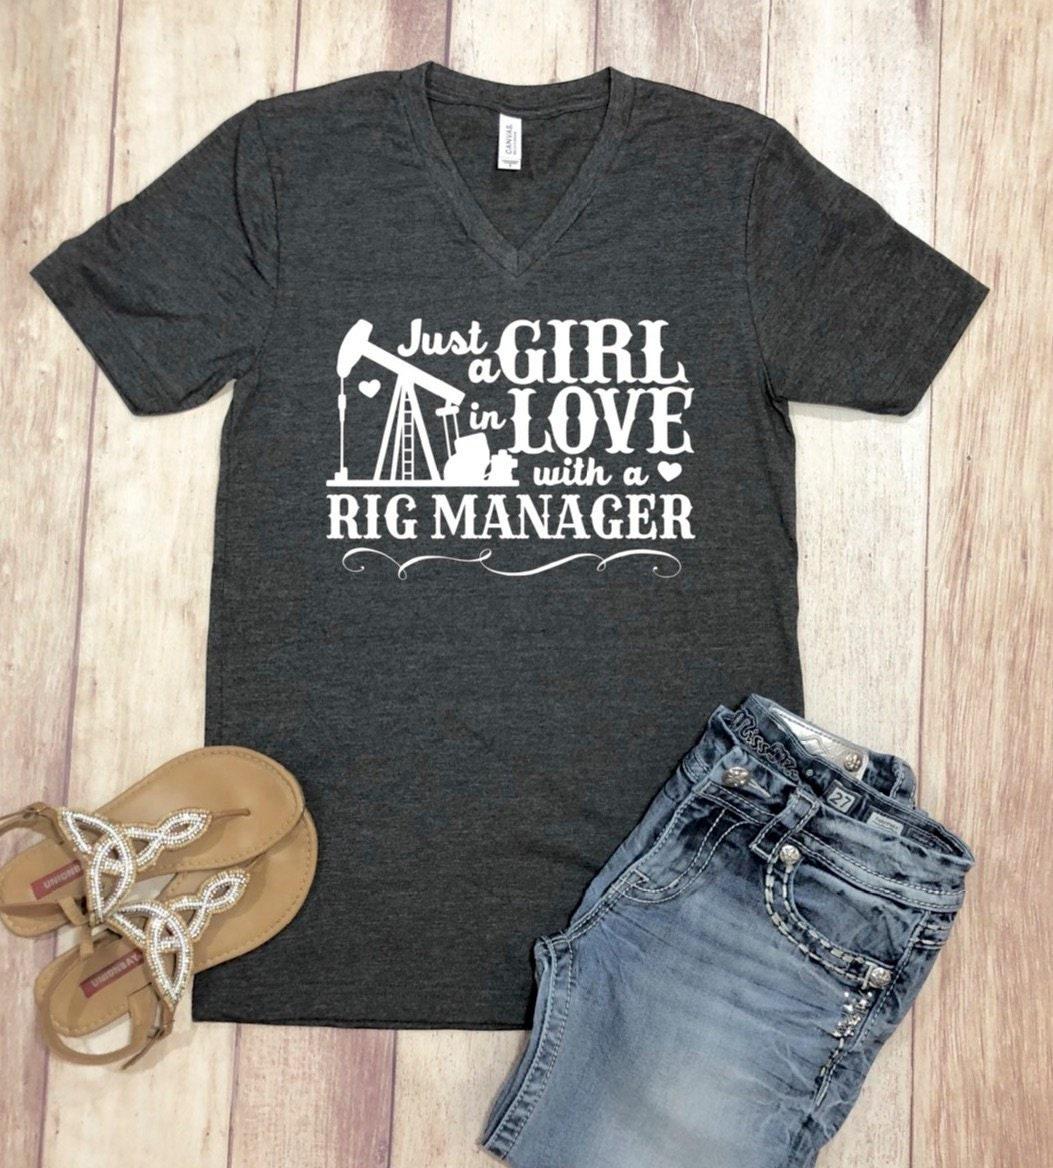 edb9bbf8 Rig Manager Shirt, Oilfield Shirt, Oilfield Wife Shirt, Oilfield ...